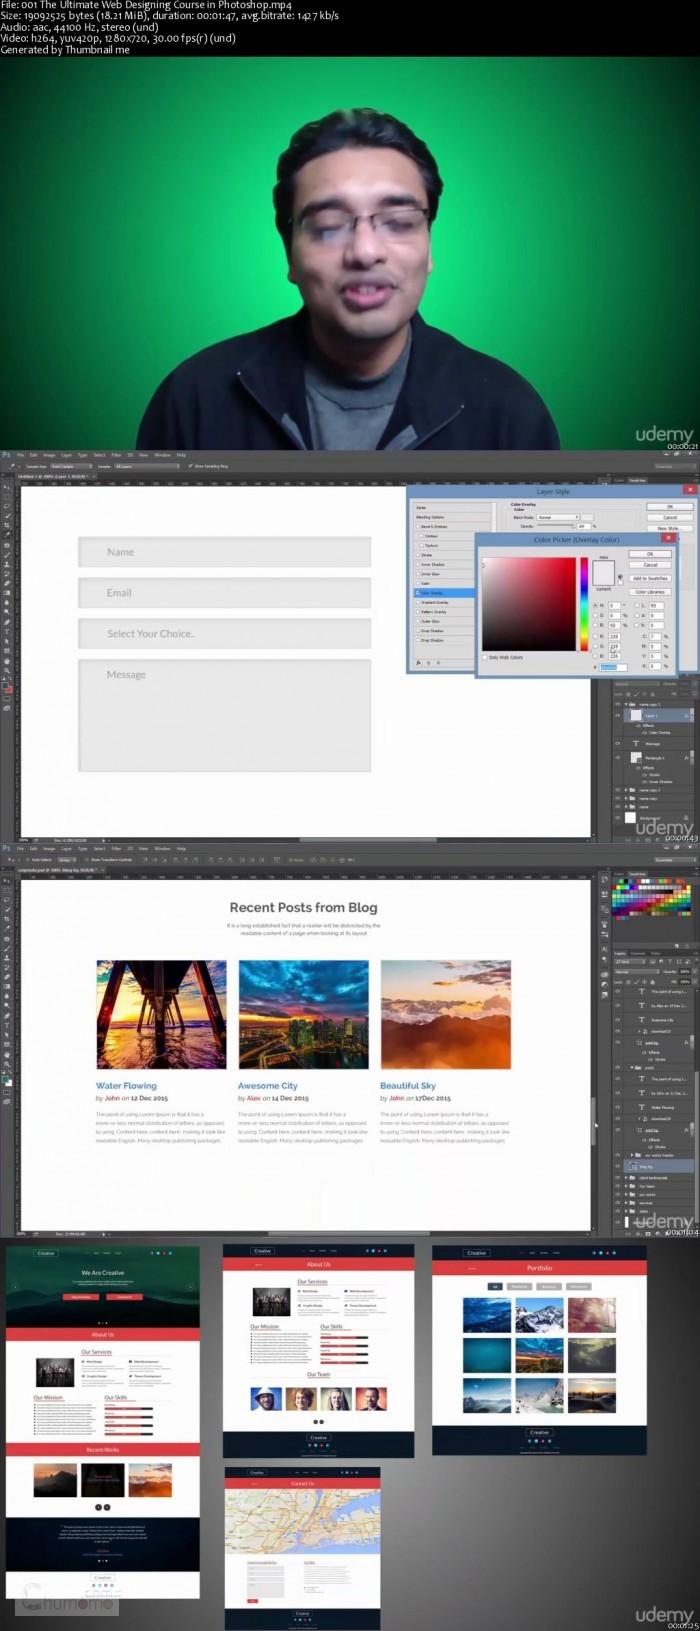 كورس تصميم المواقع بالفوتوشوب The Ultimate Web Designing Course in Photoshop (2)